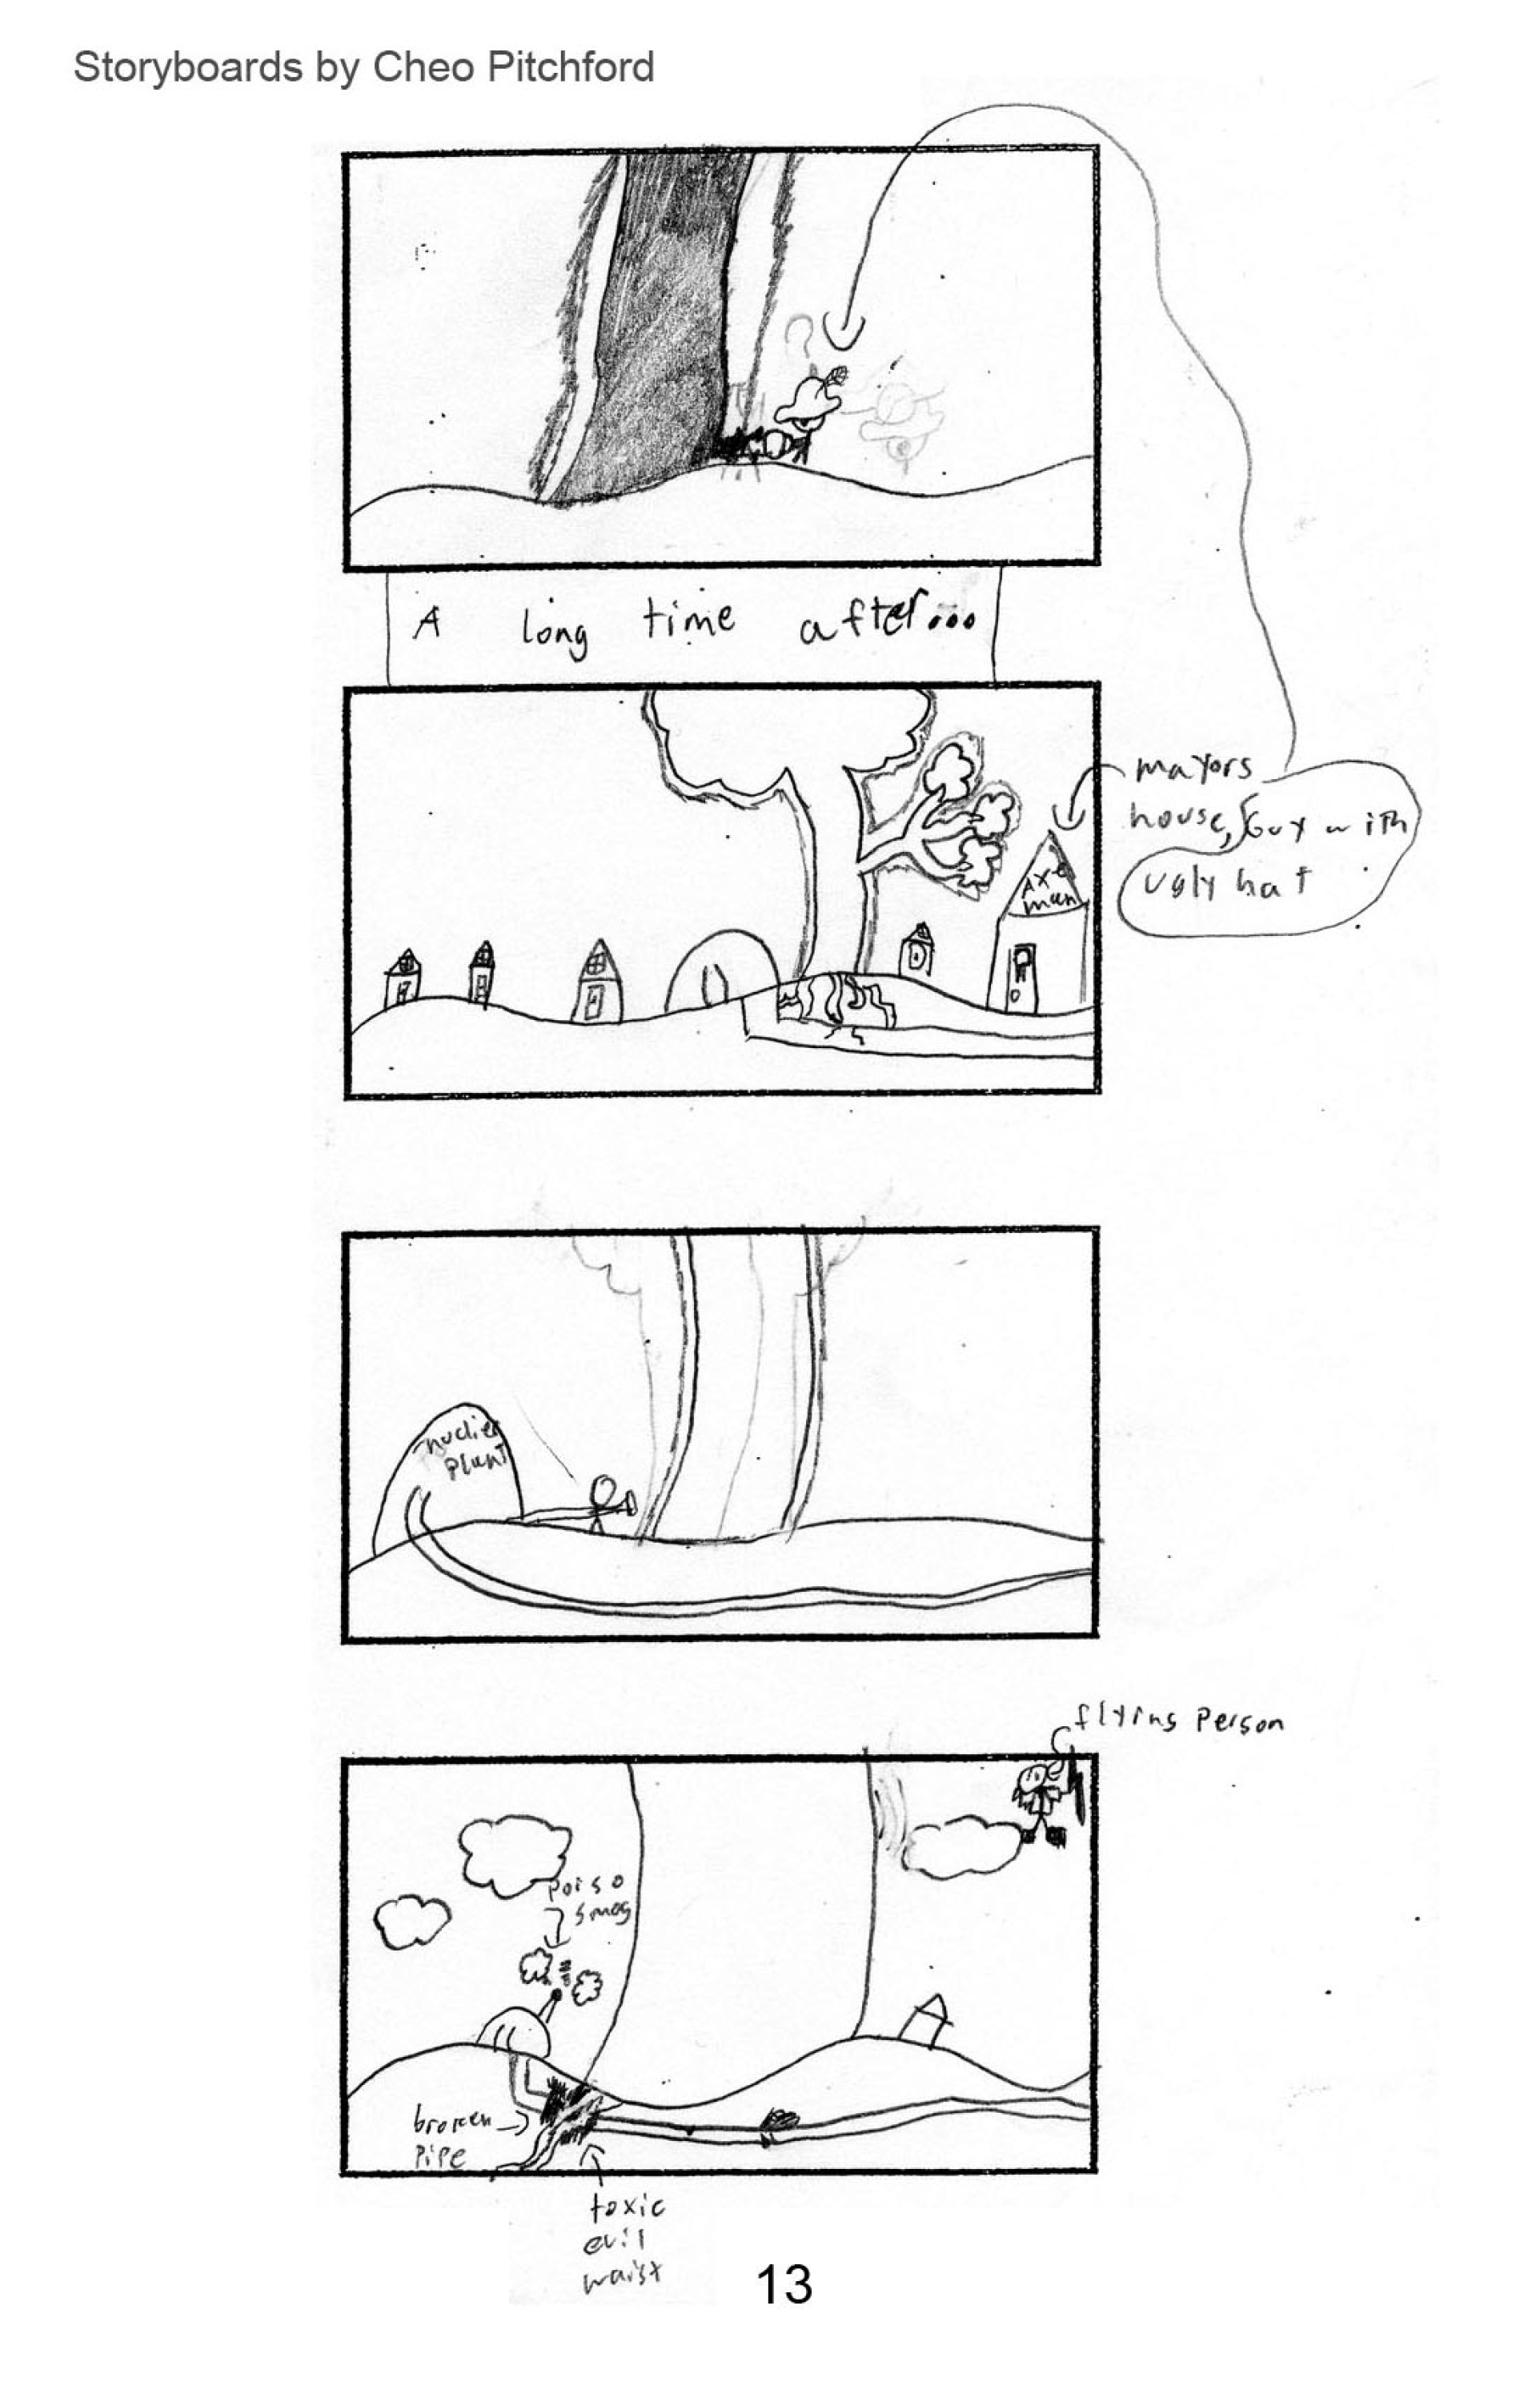 ev page 13.jpg